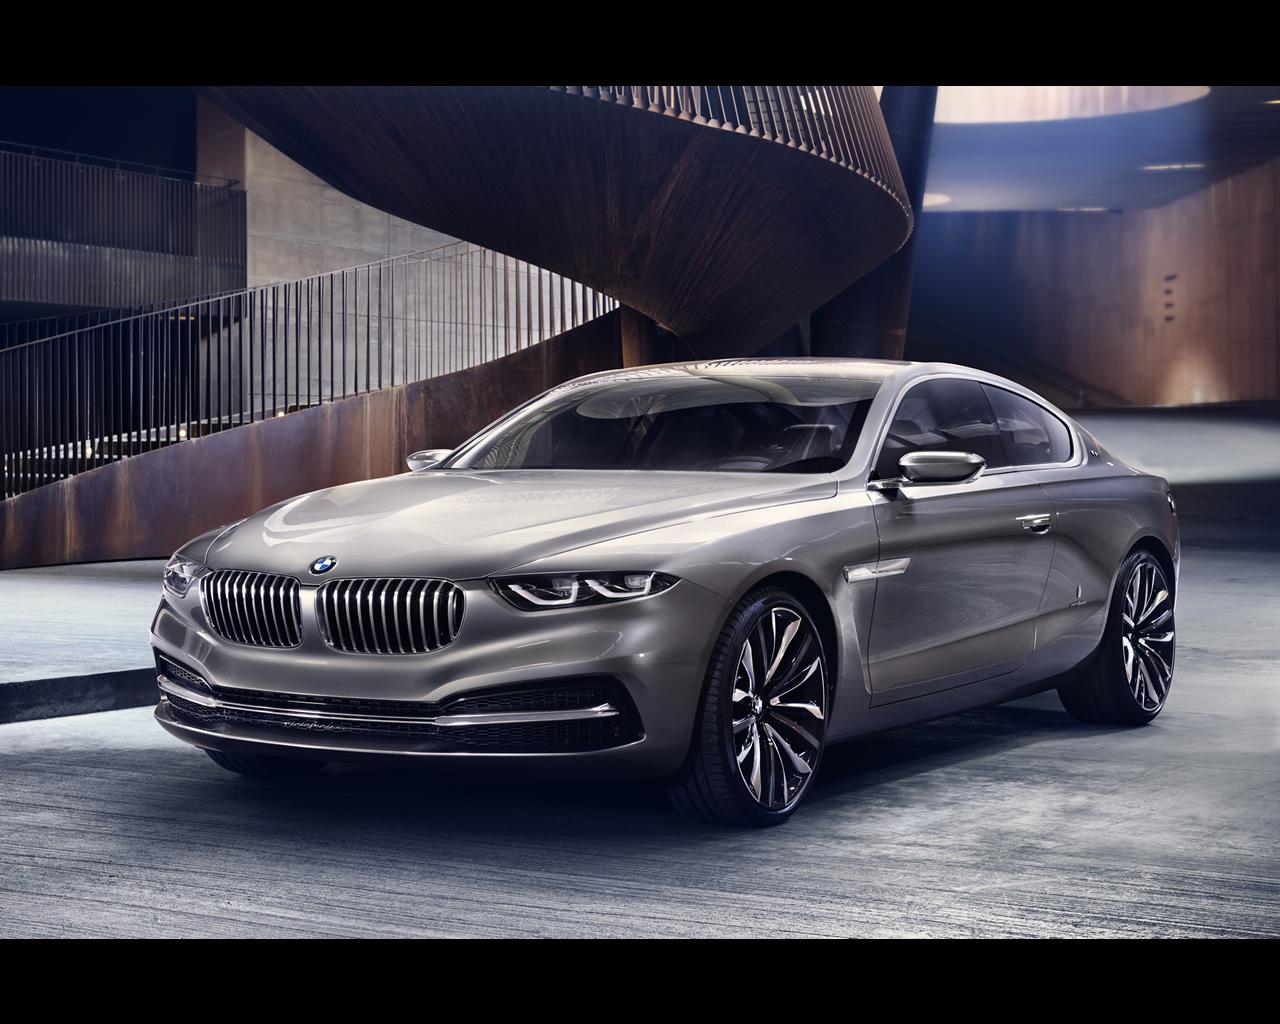 Alfa img - Showing > Signature BMW Lights Wallpaper